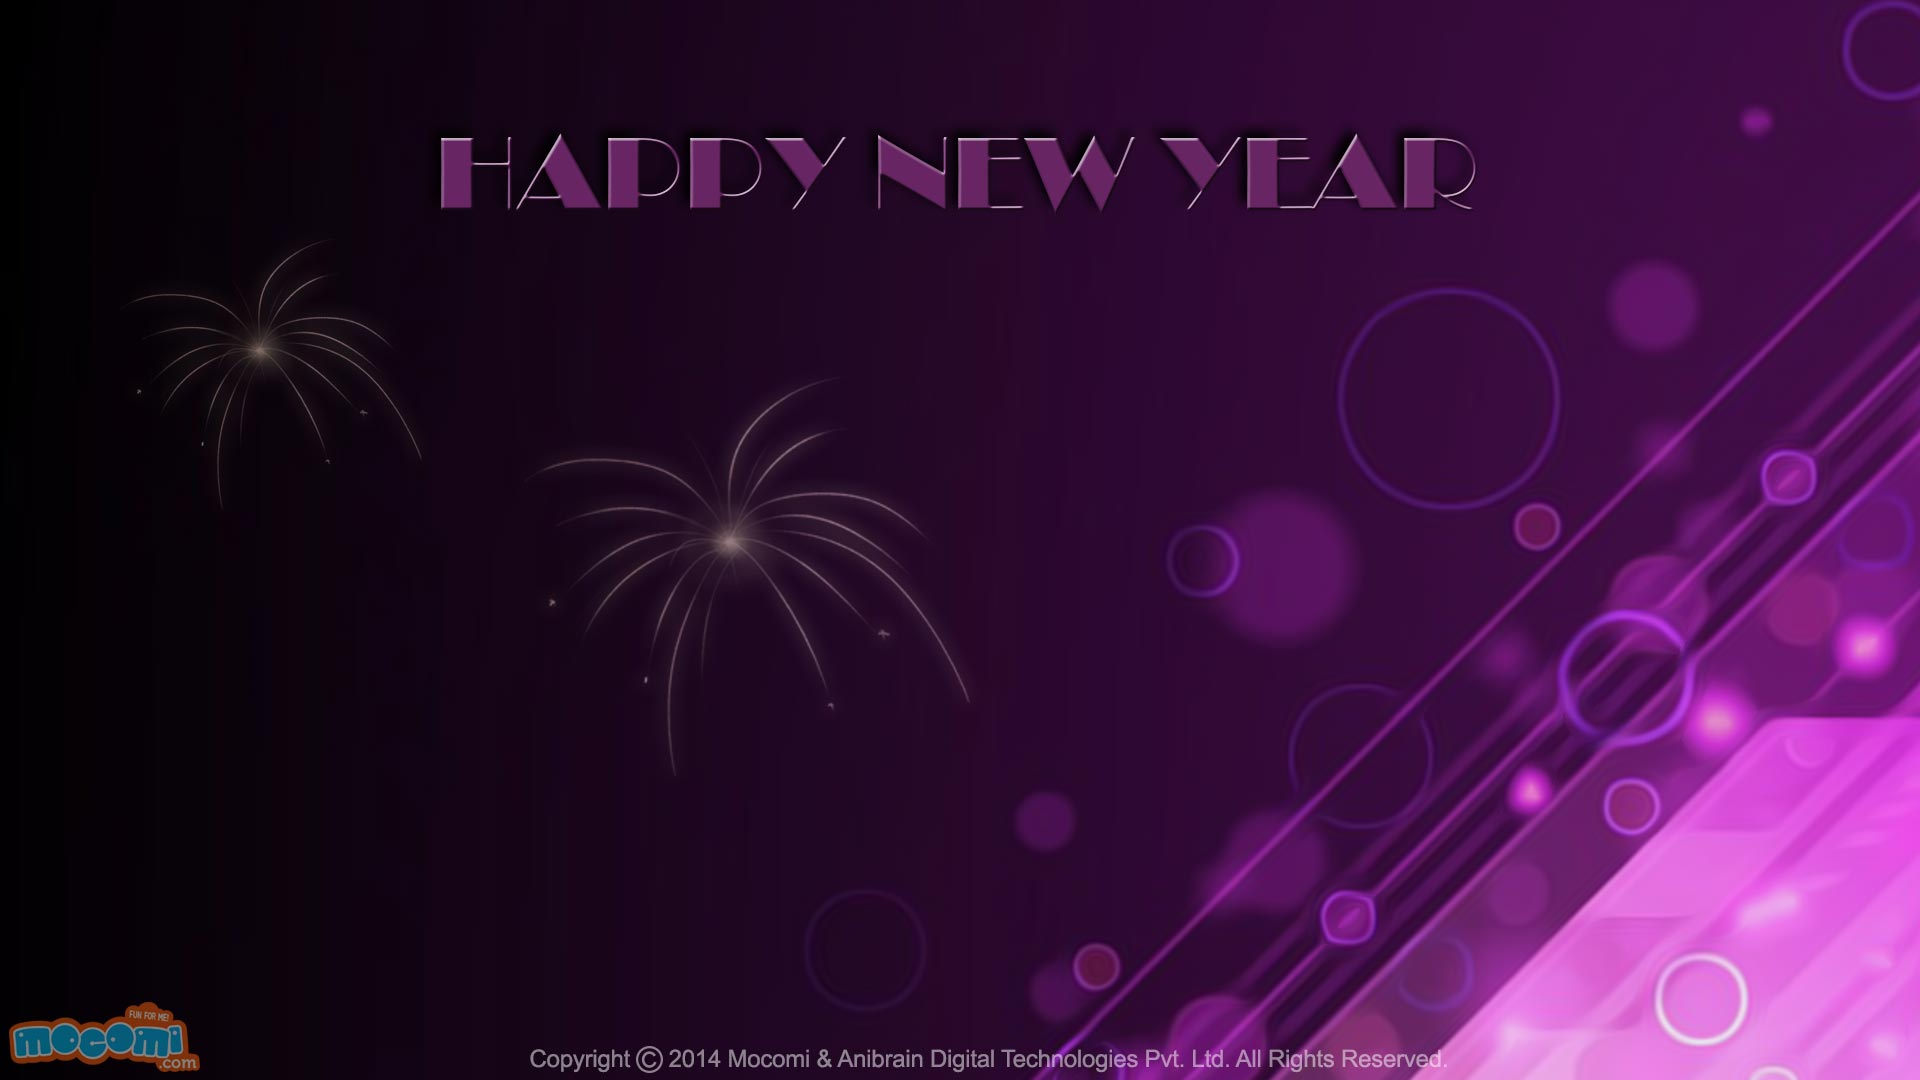 Happy New Year Wallpaper- 11